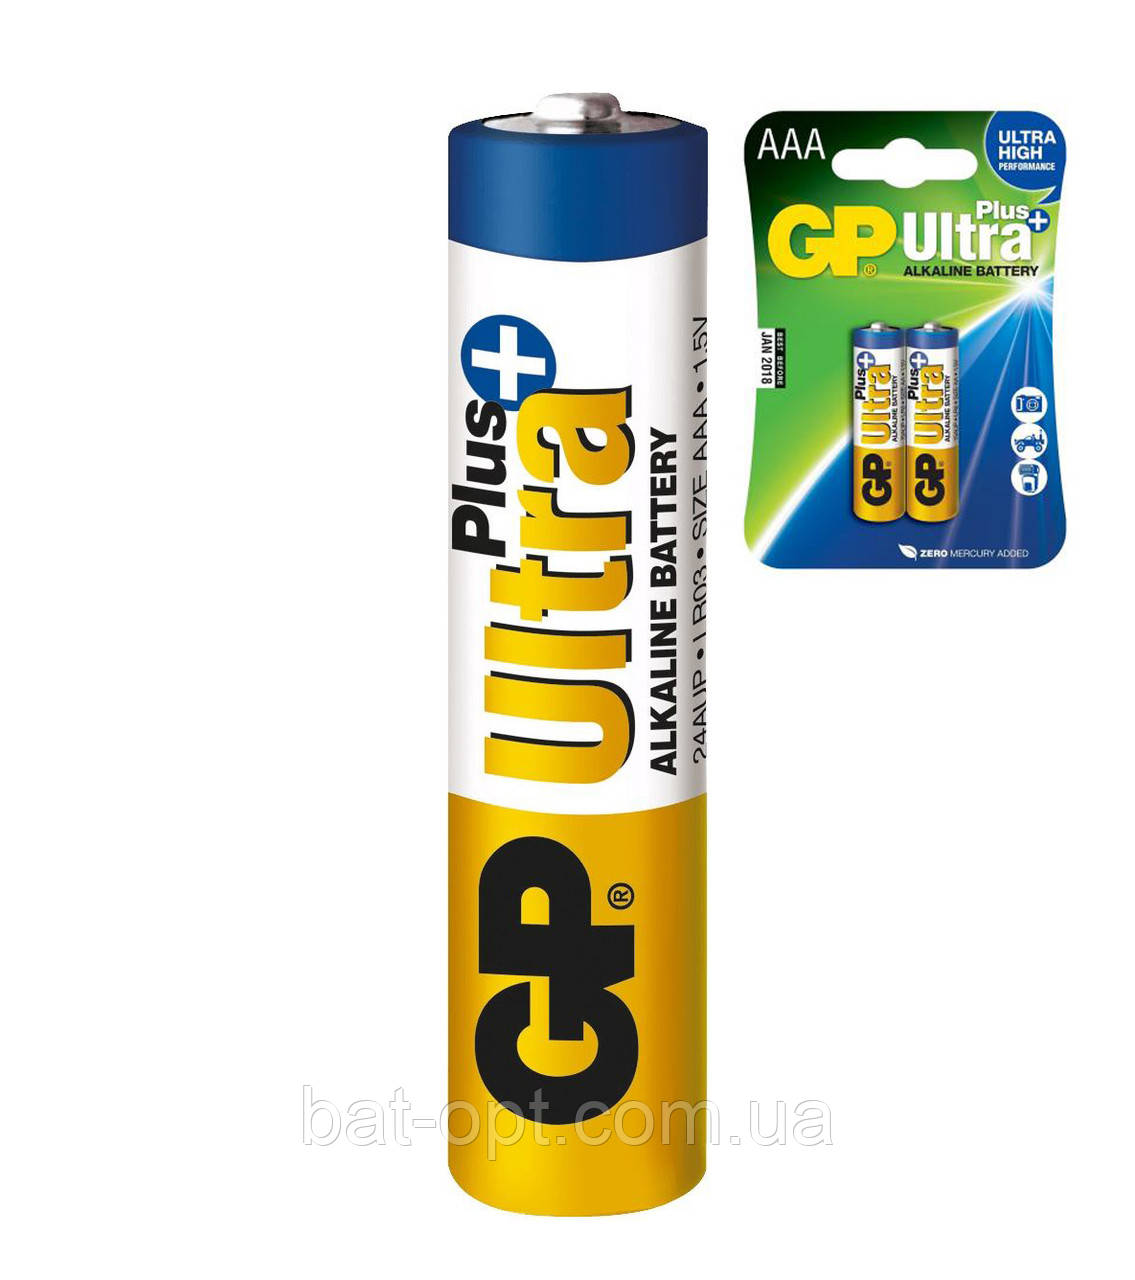 Батарейка щелочная GP 24AUP-U2 Ultra Plus Alkaline LR3 AAA минипальчиковая (блистер)